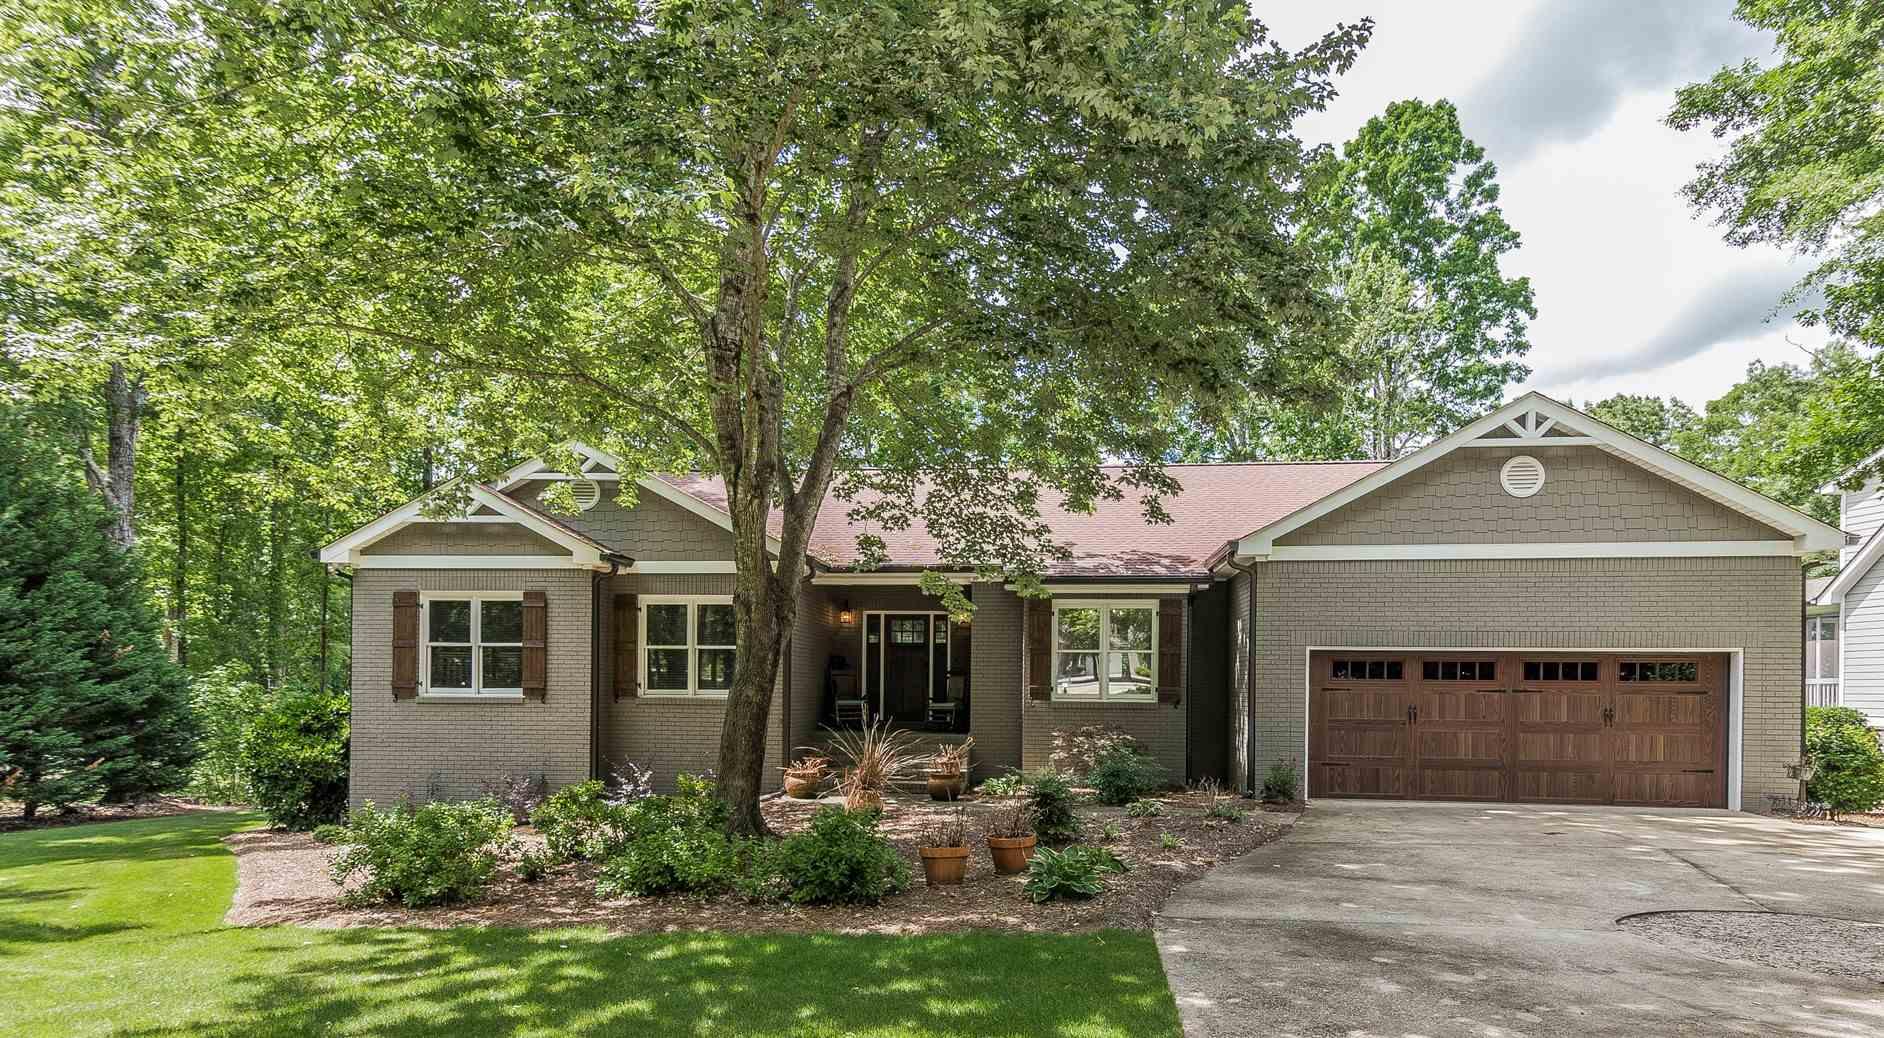 129 SHELBY DRIVE, Lake Oconee in Putnam County, GA 31024 Home for Sale